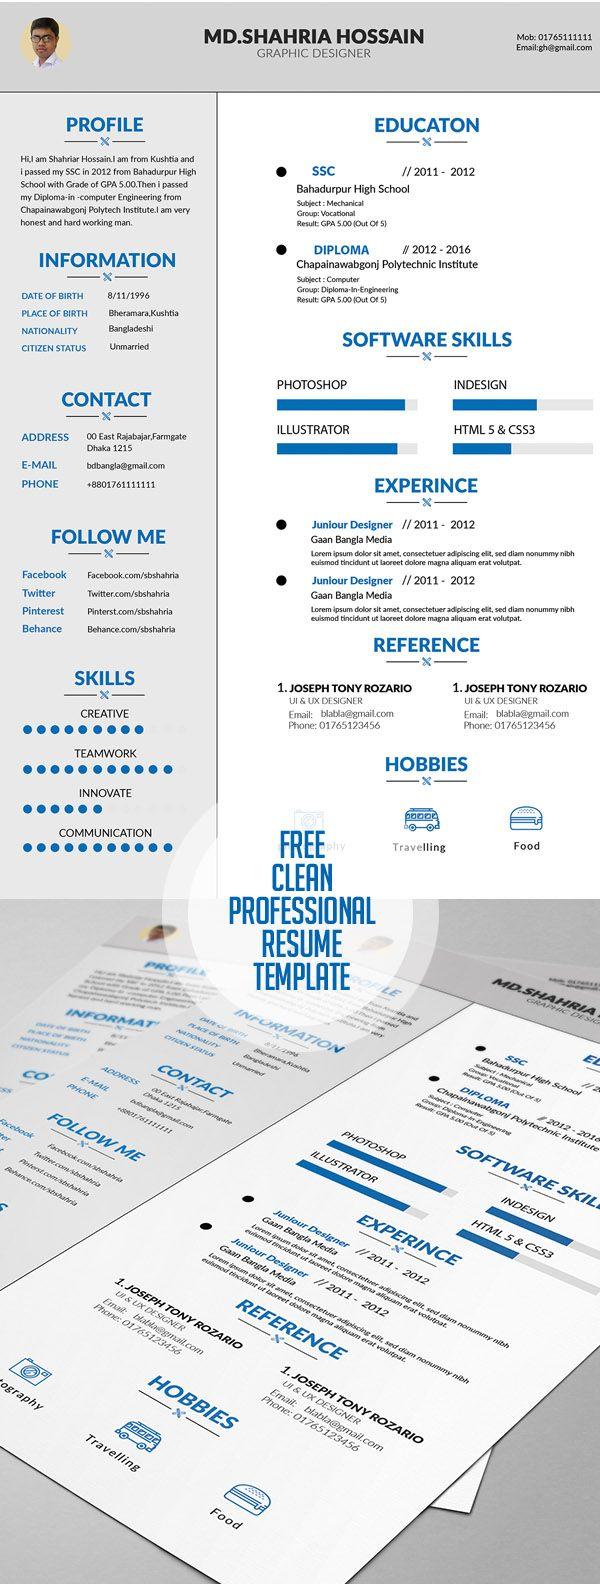 Free Clean Proffesional Resume Design #resume templates #coverletter #cvresume #freepsdfiles #freebies #minimalresume #portfoliopage